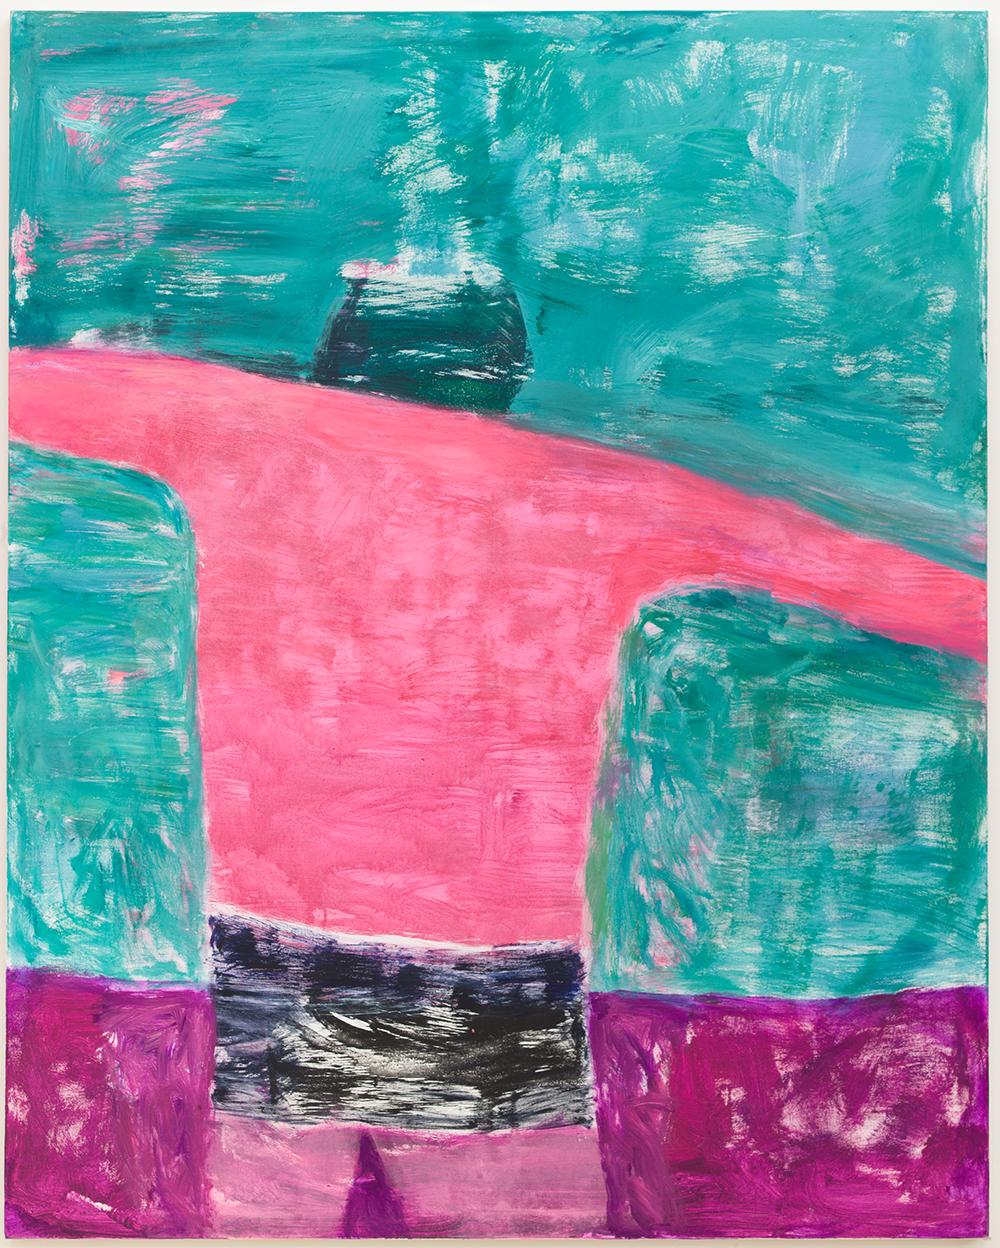 "Katherine Bradford,  Swimmer Racer , 2018. Acrylic on canvas. 60 x 48"" 152.4 x 121.9 cm"